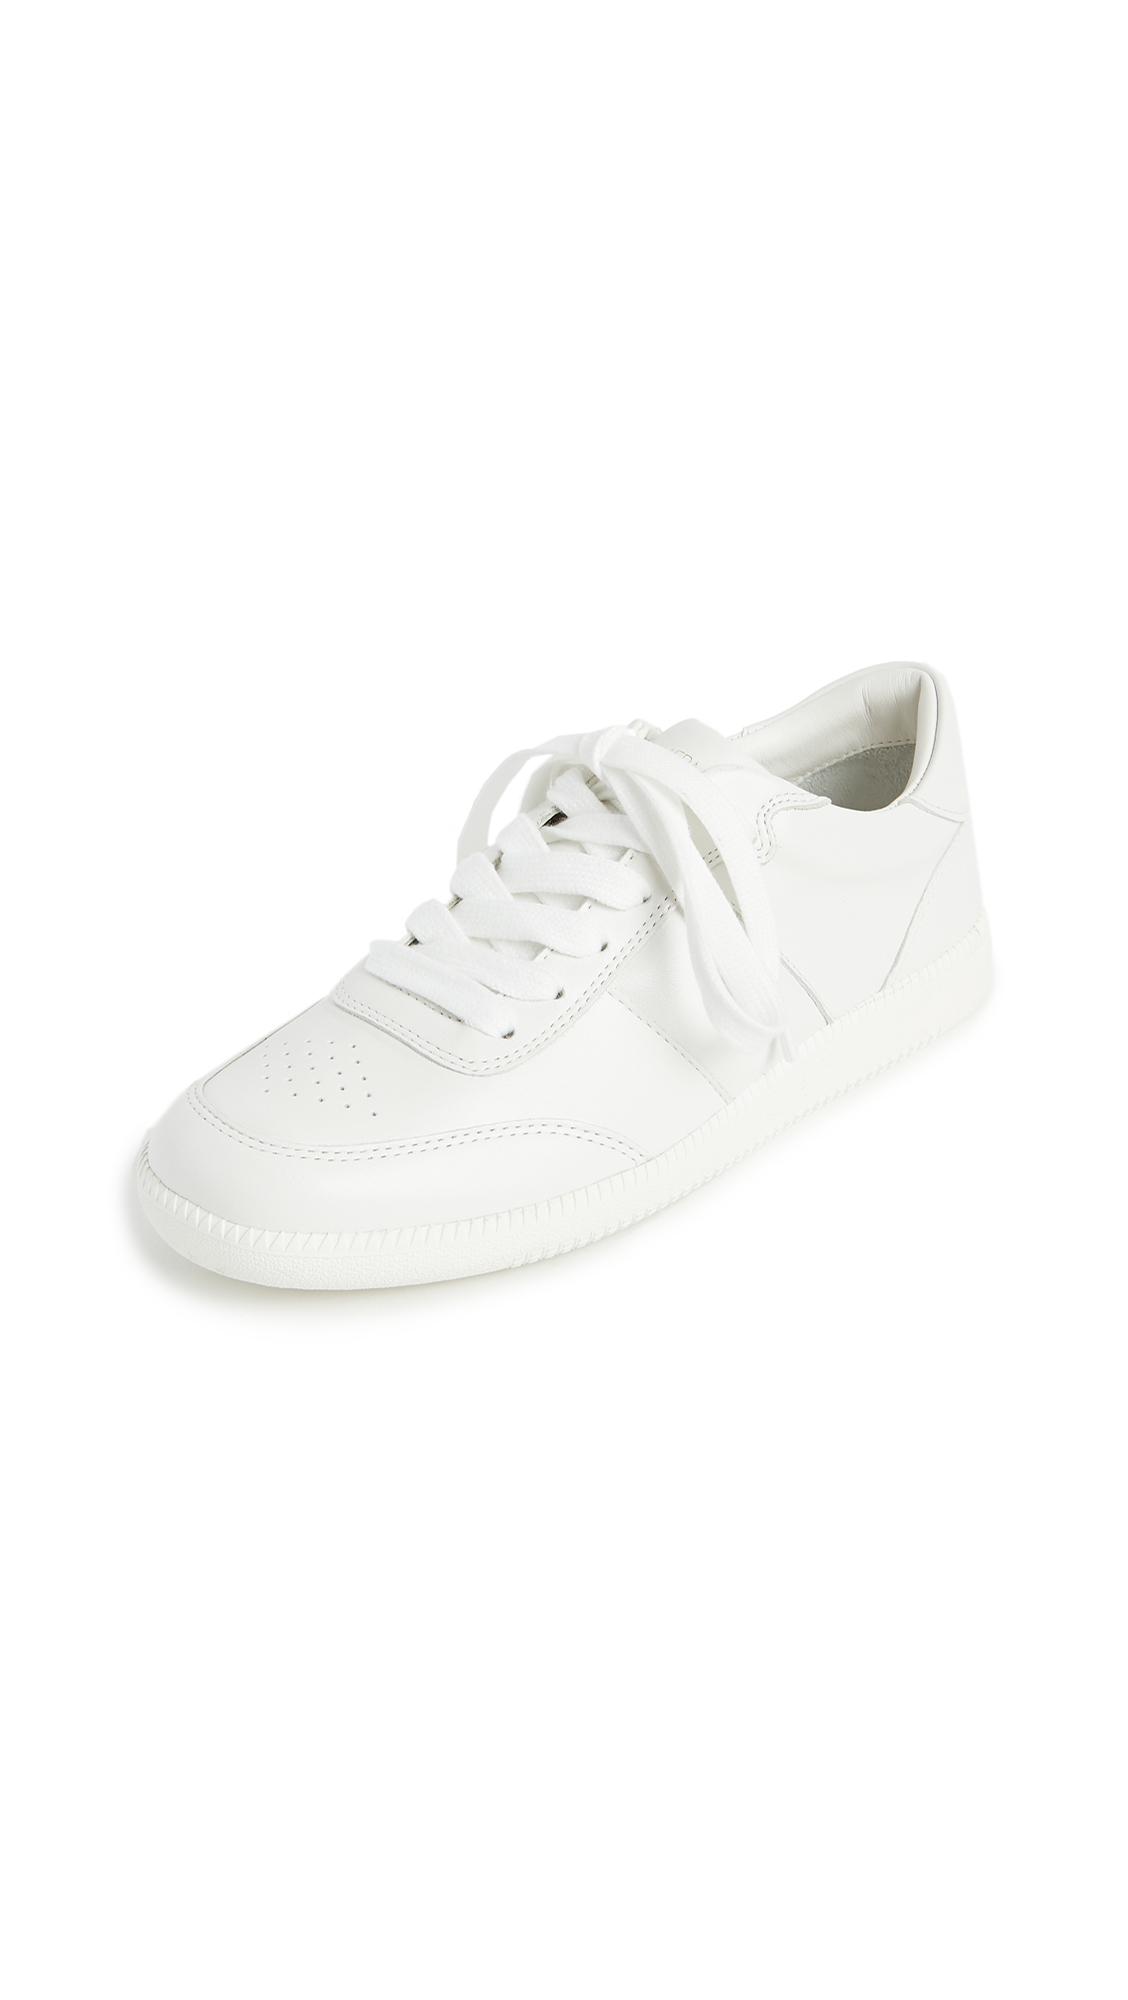 Zimmermann Low Top Retro Sneakers In White